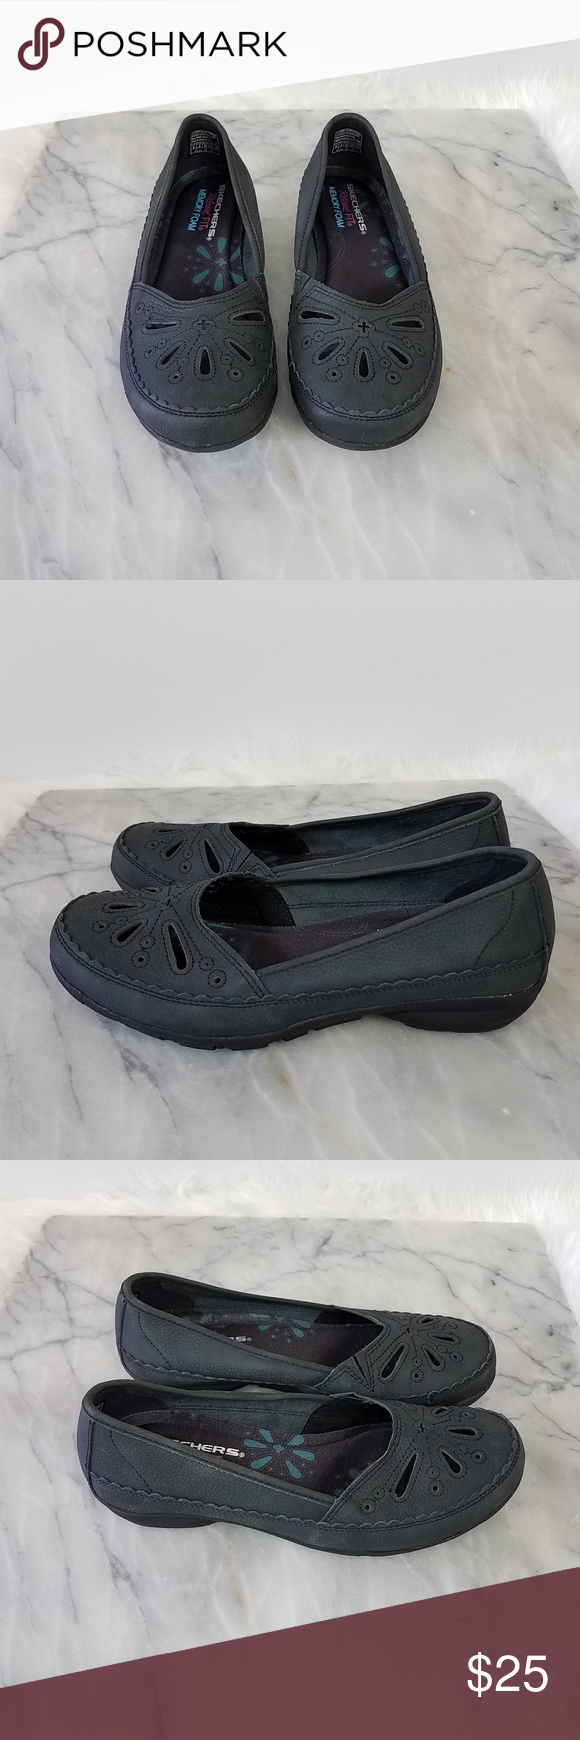 online zu verkaufen Mode-Design wie man serch Skechers Career Flower Power Flat Black Leather 6 Skechers ...